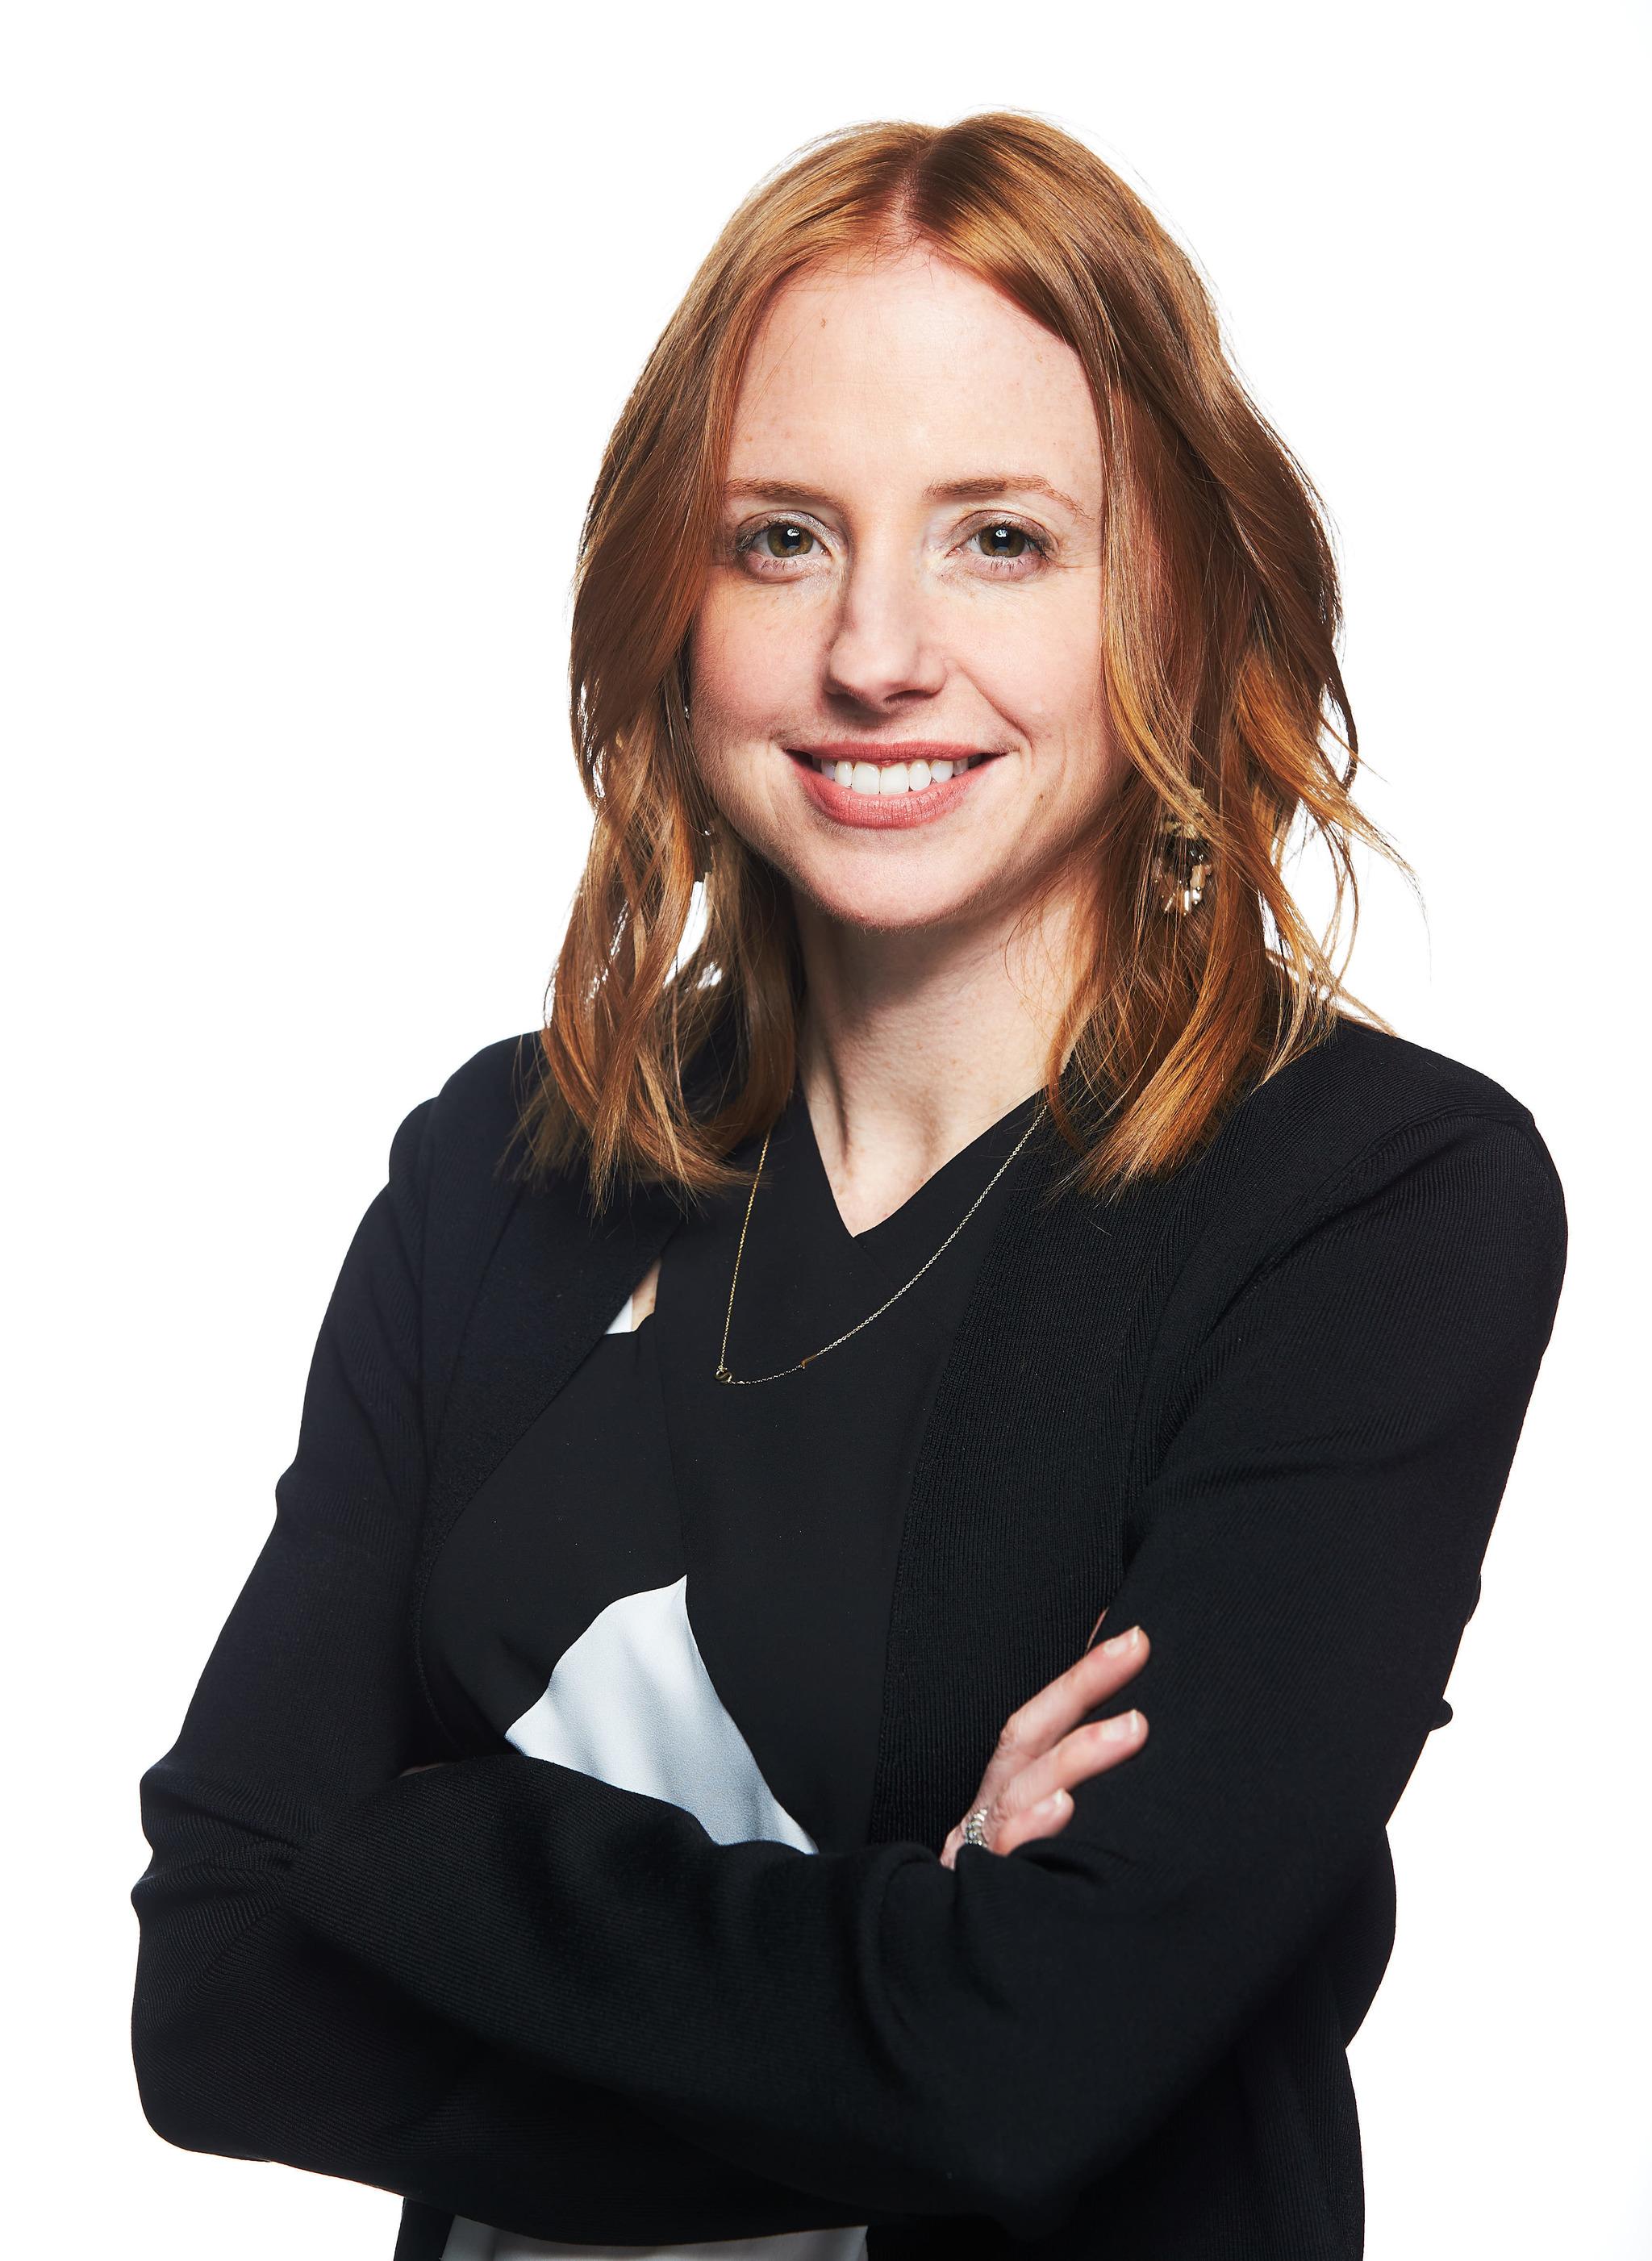 Sarah Gretczko